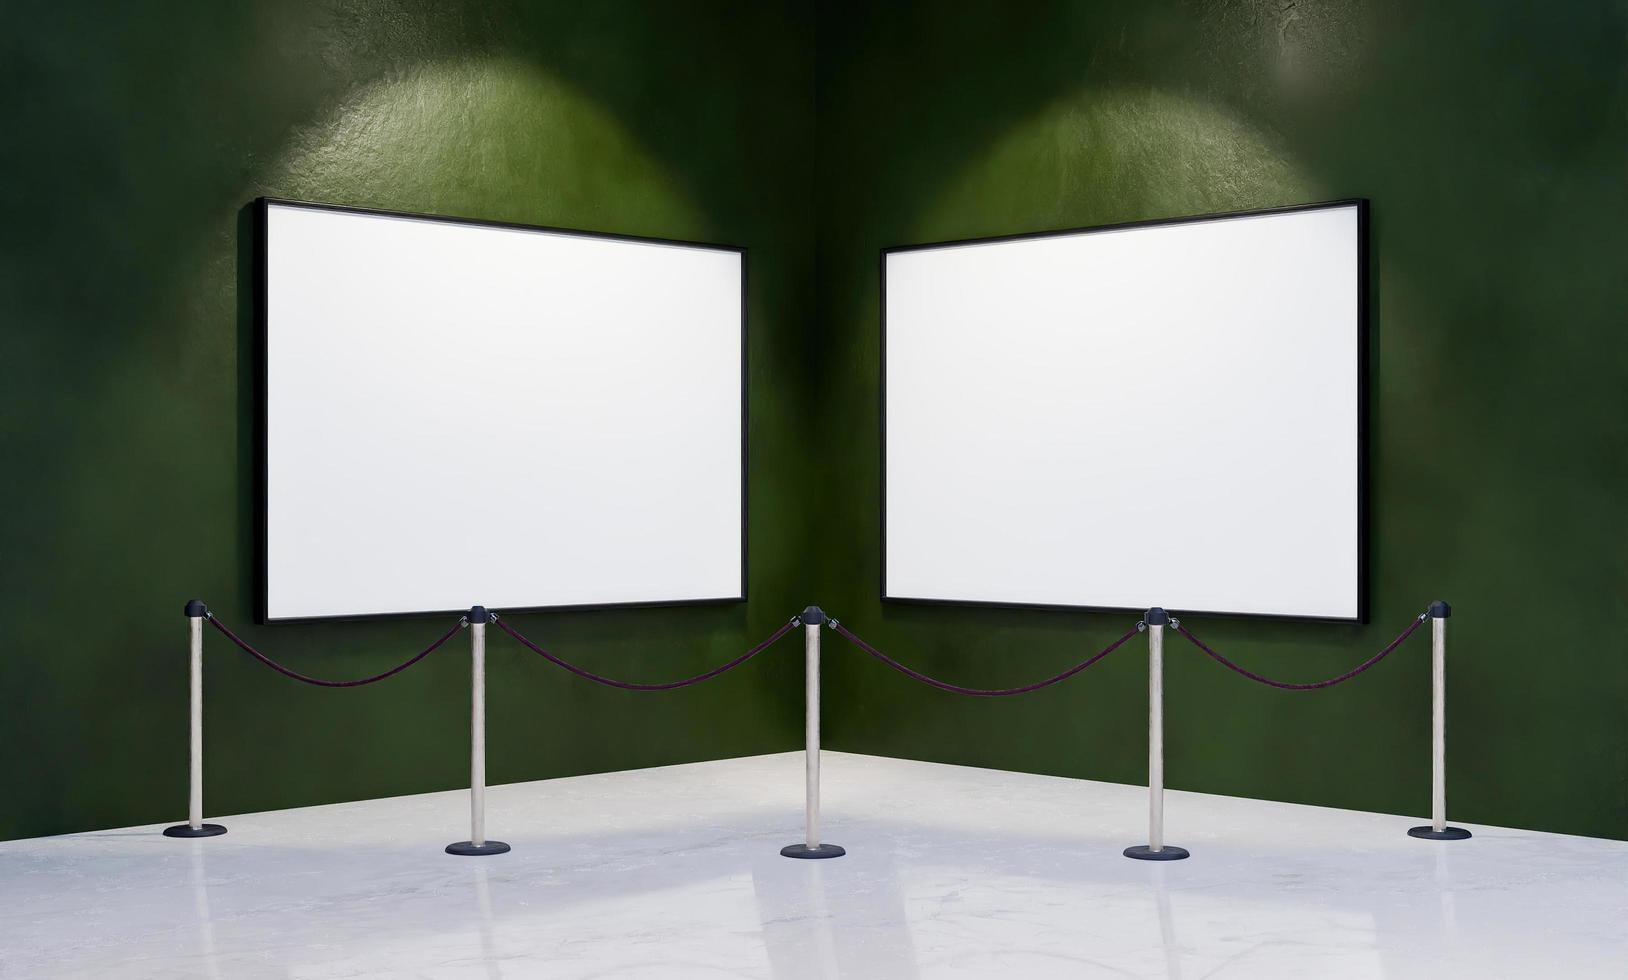 maqueta de marcos en la esquina de un museo foto